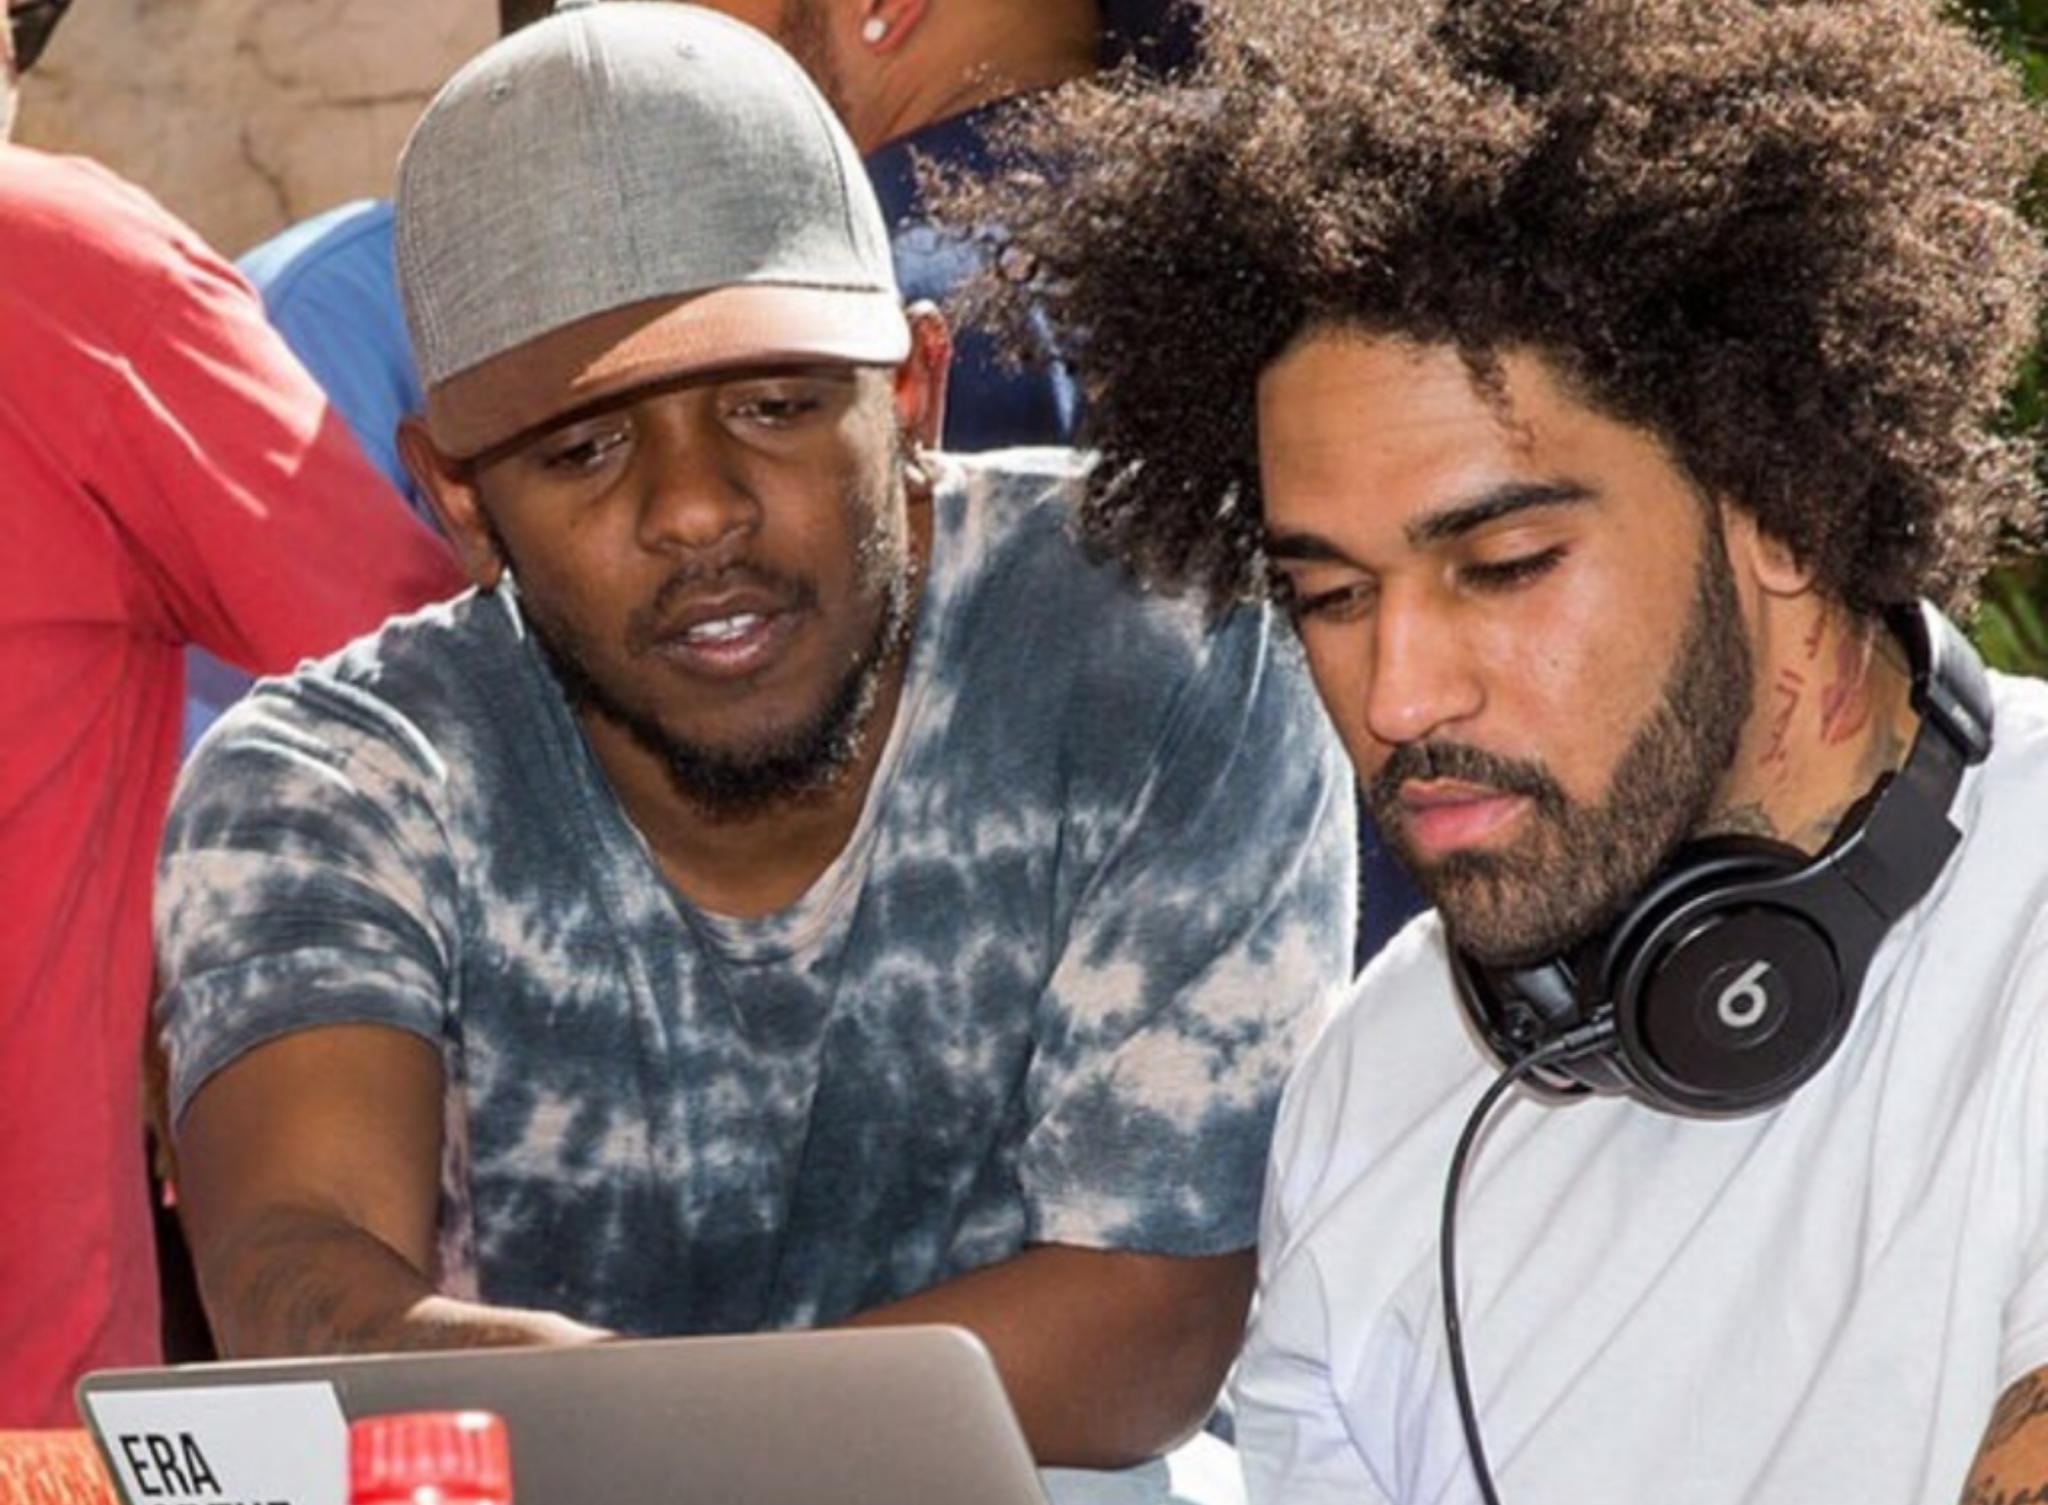 Kendrick Lamar and MixedByAli